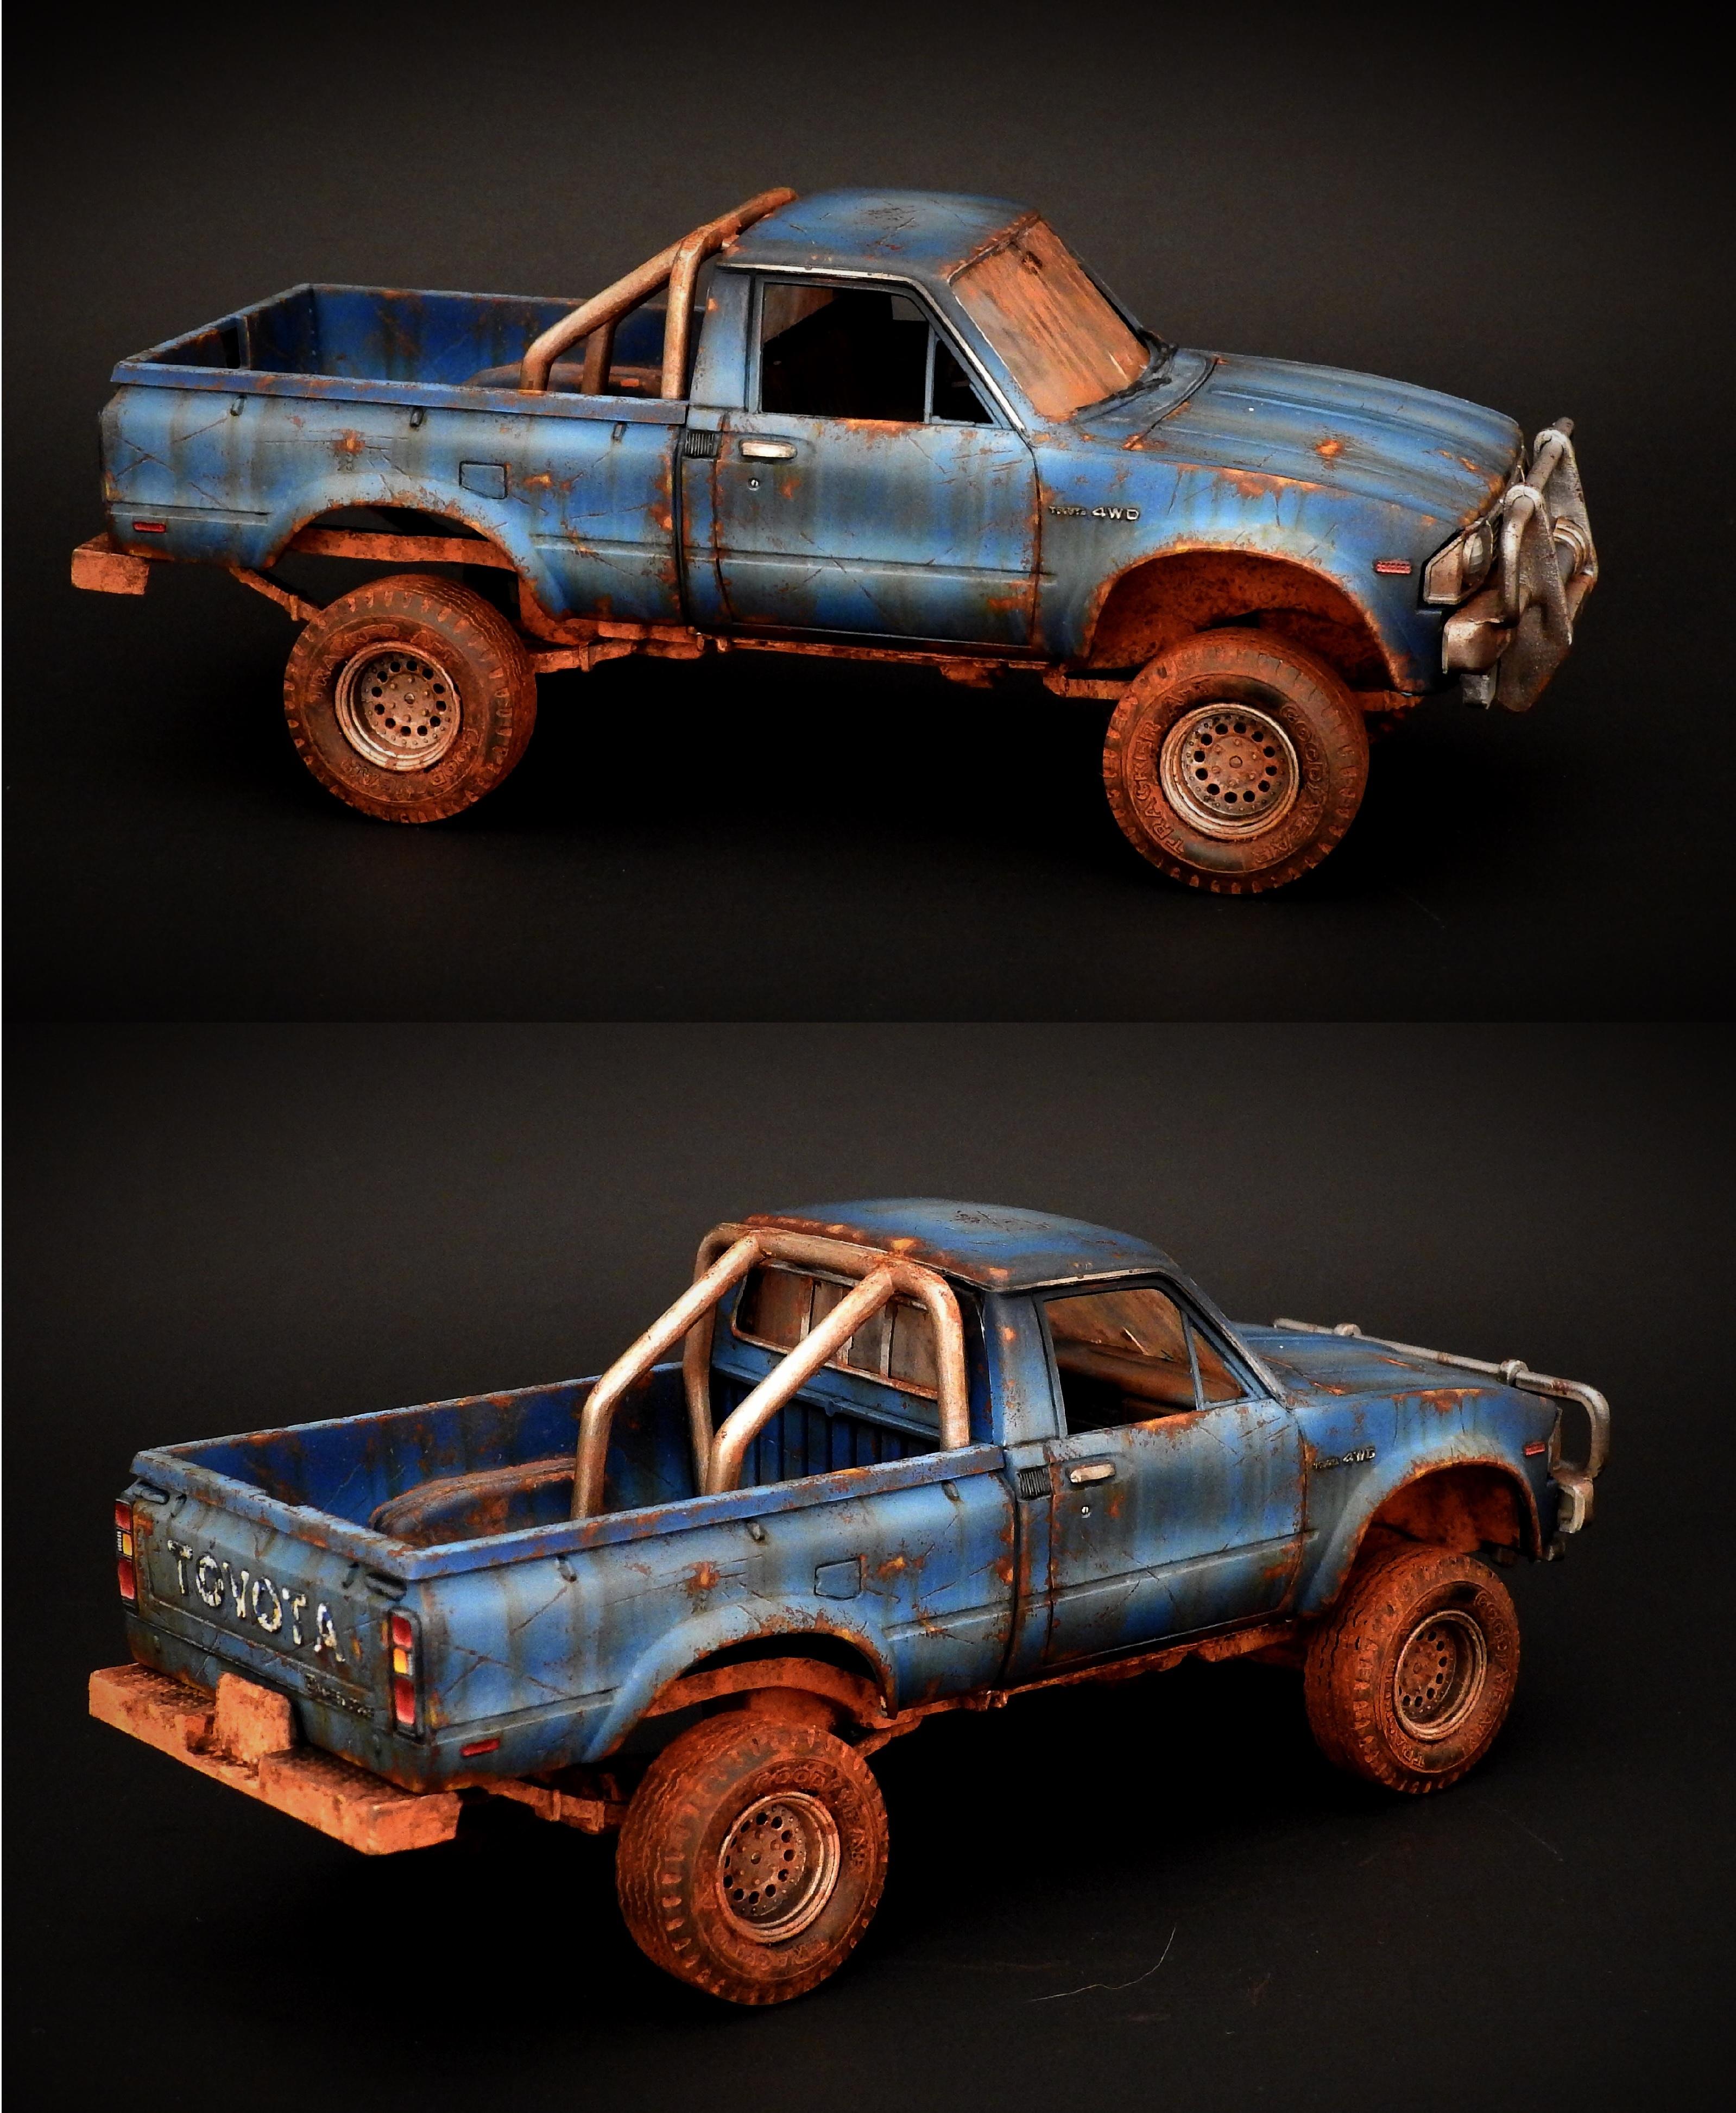 1984 Post Apocalyptic 4x4 Toyota Truck